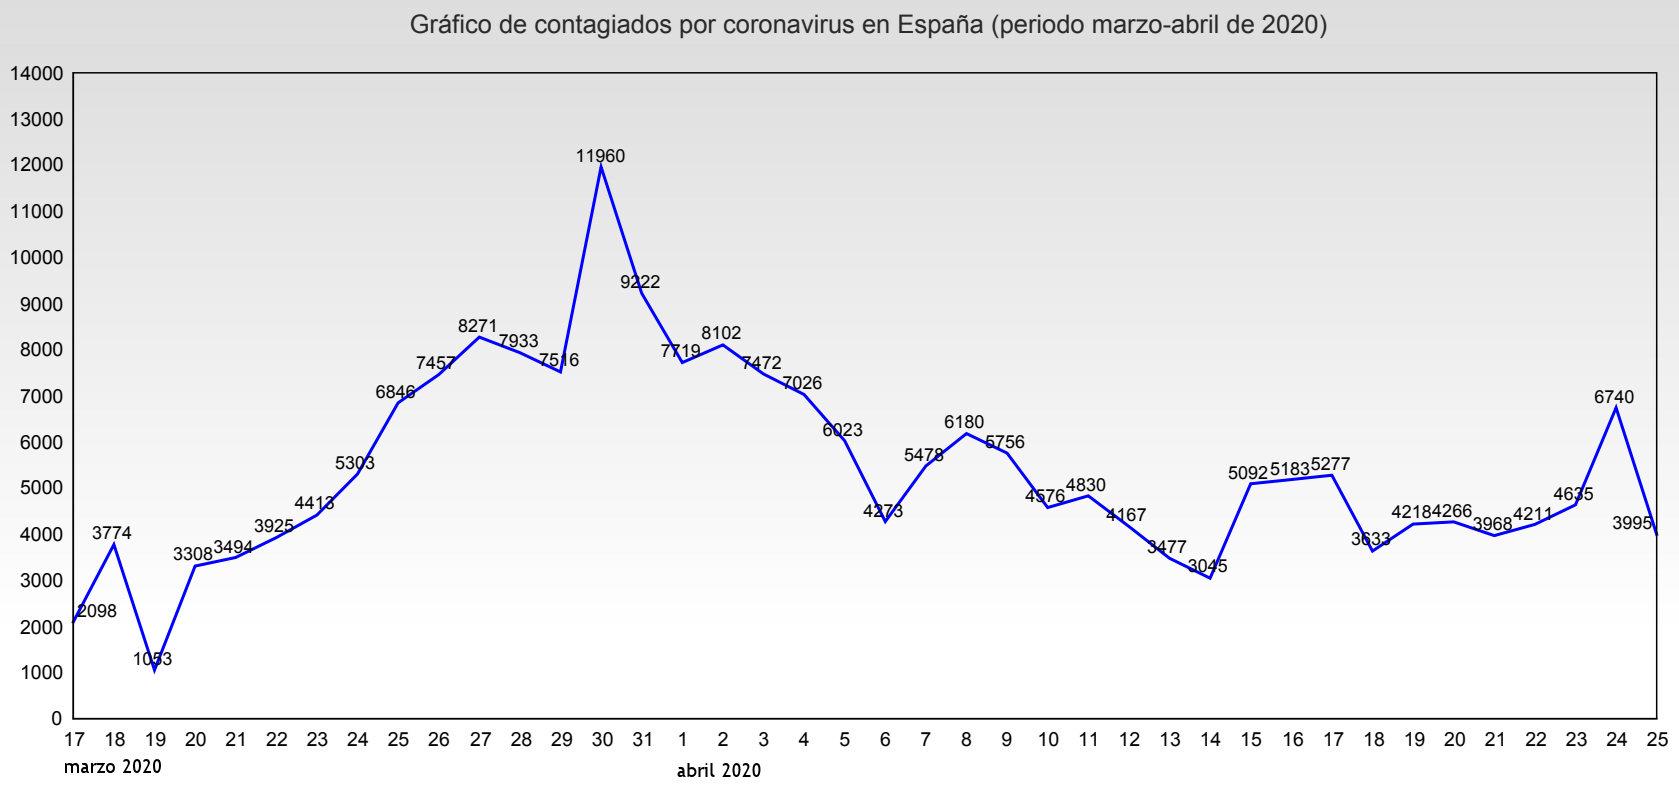 coronavirus contagiados espana diagrama lineal